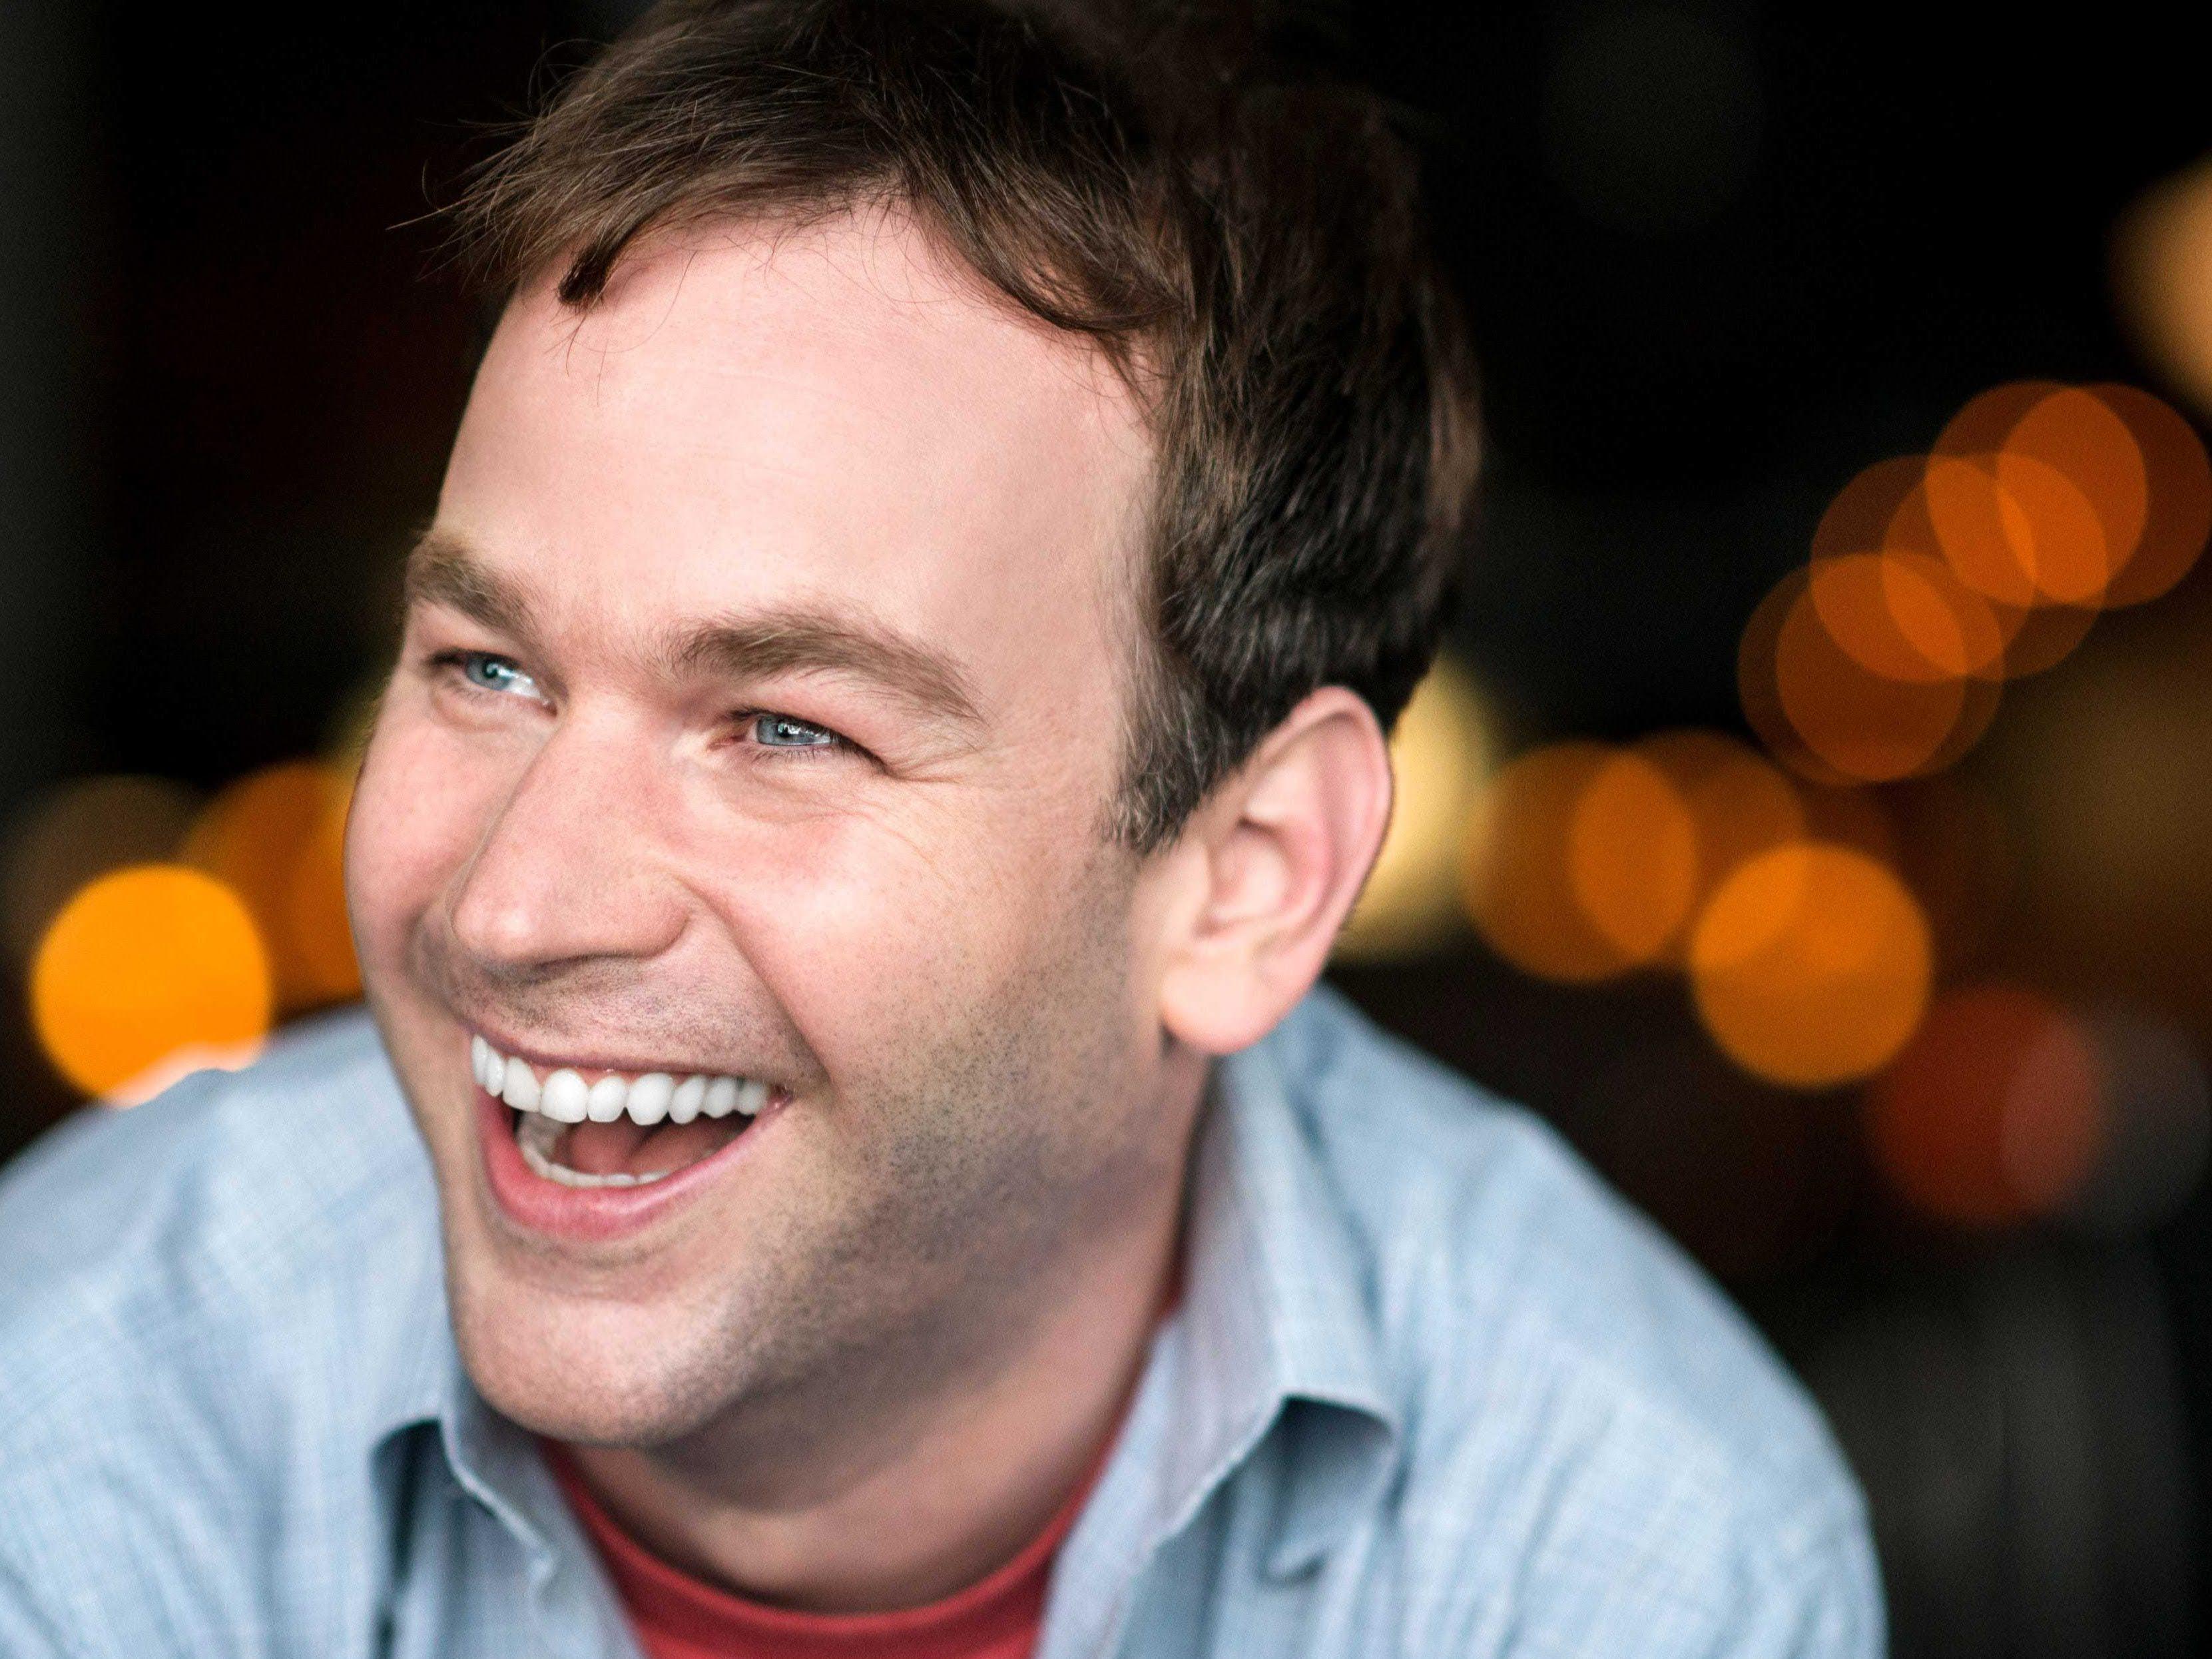 Connecting despite COVID-19: Mike Birbiglia tells jokes to support Comedy Attic workers